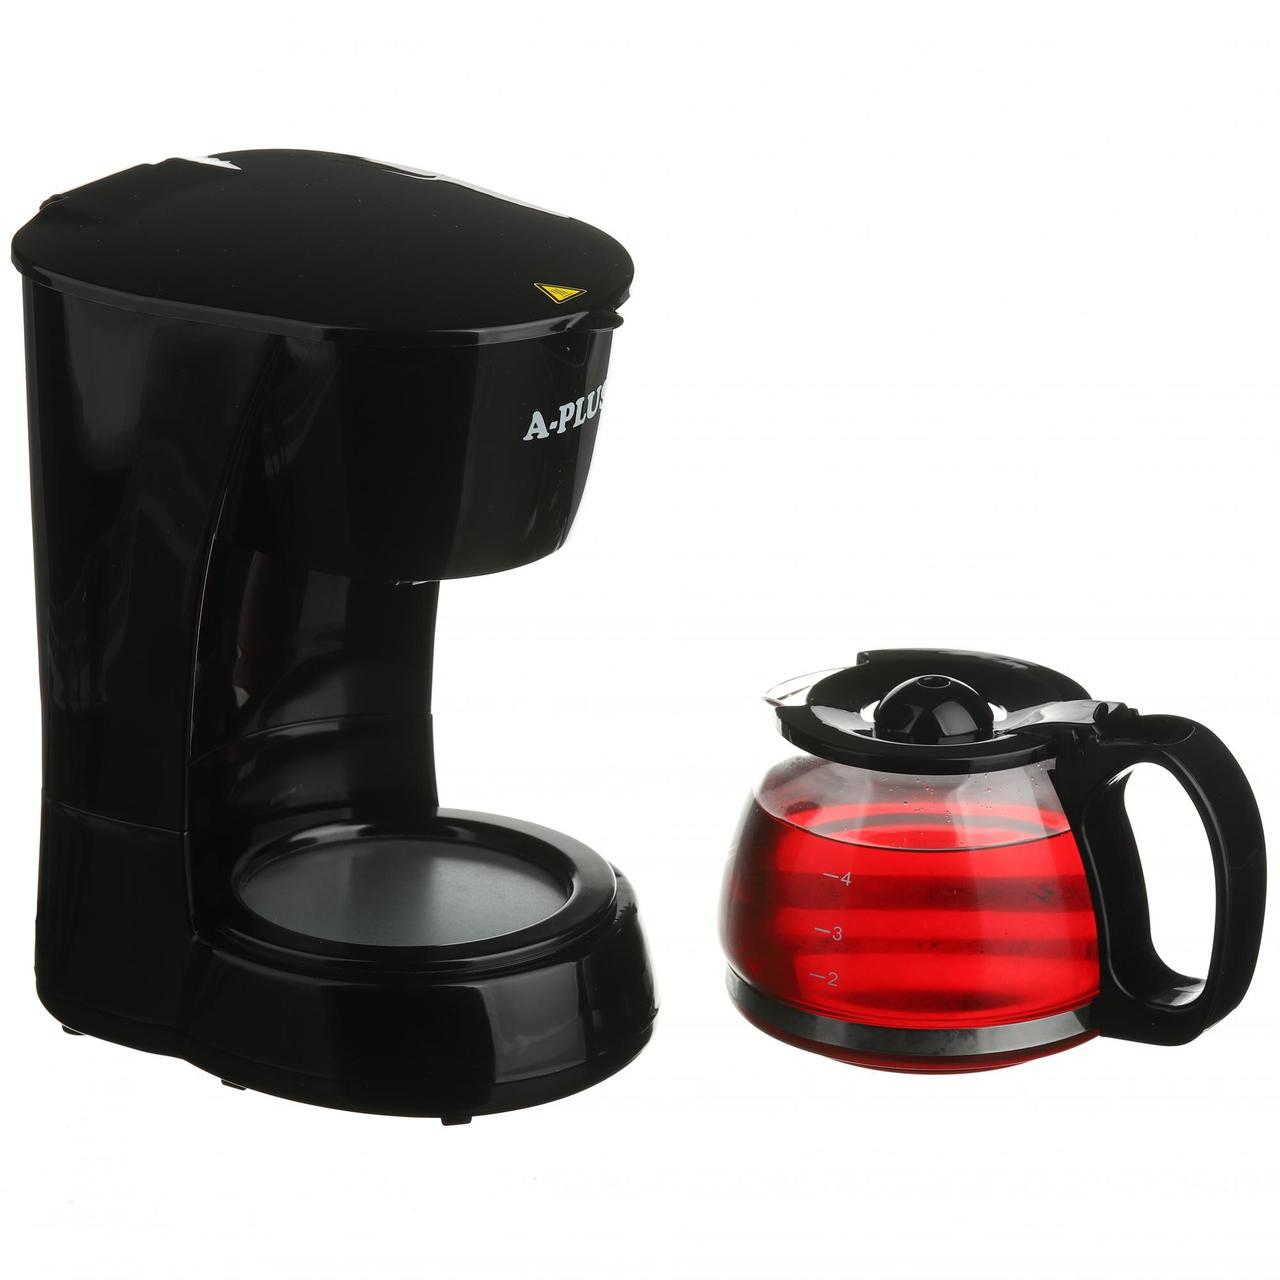 Краплинна кавоварка електрична A-PLUS кавомашина крапельного типу